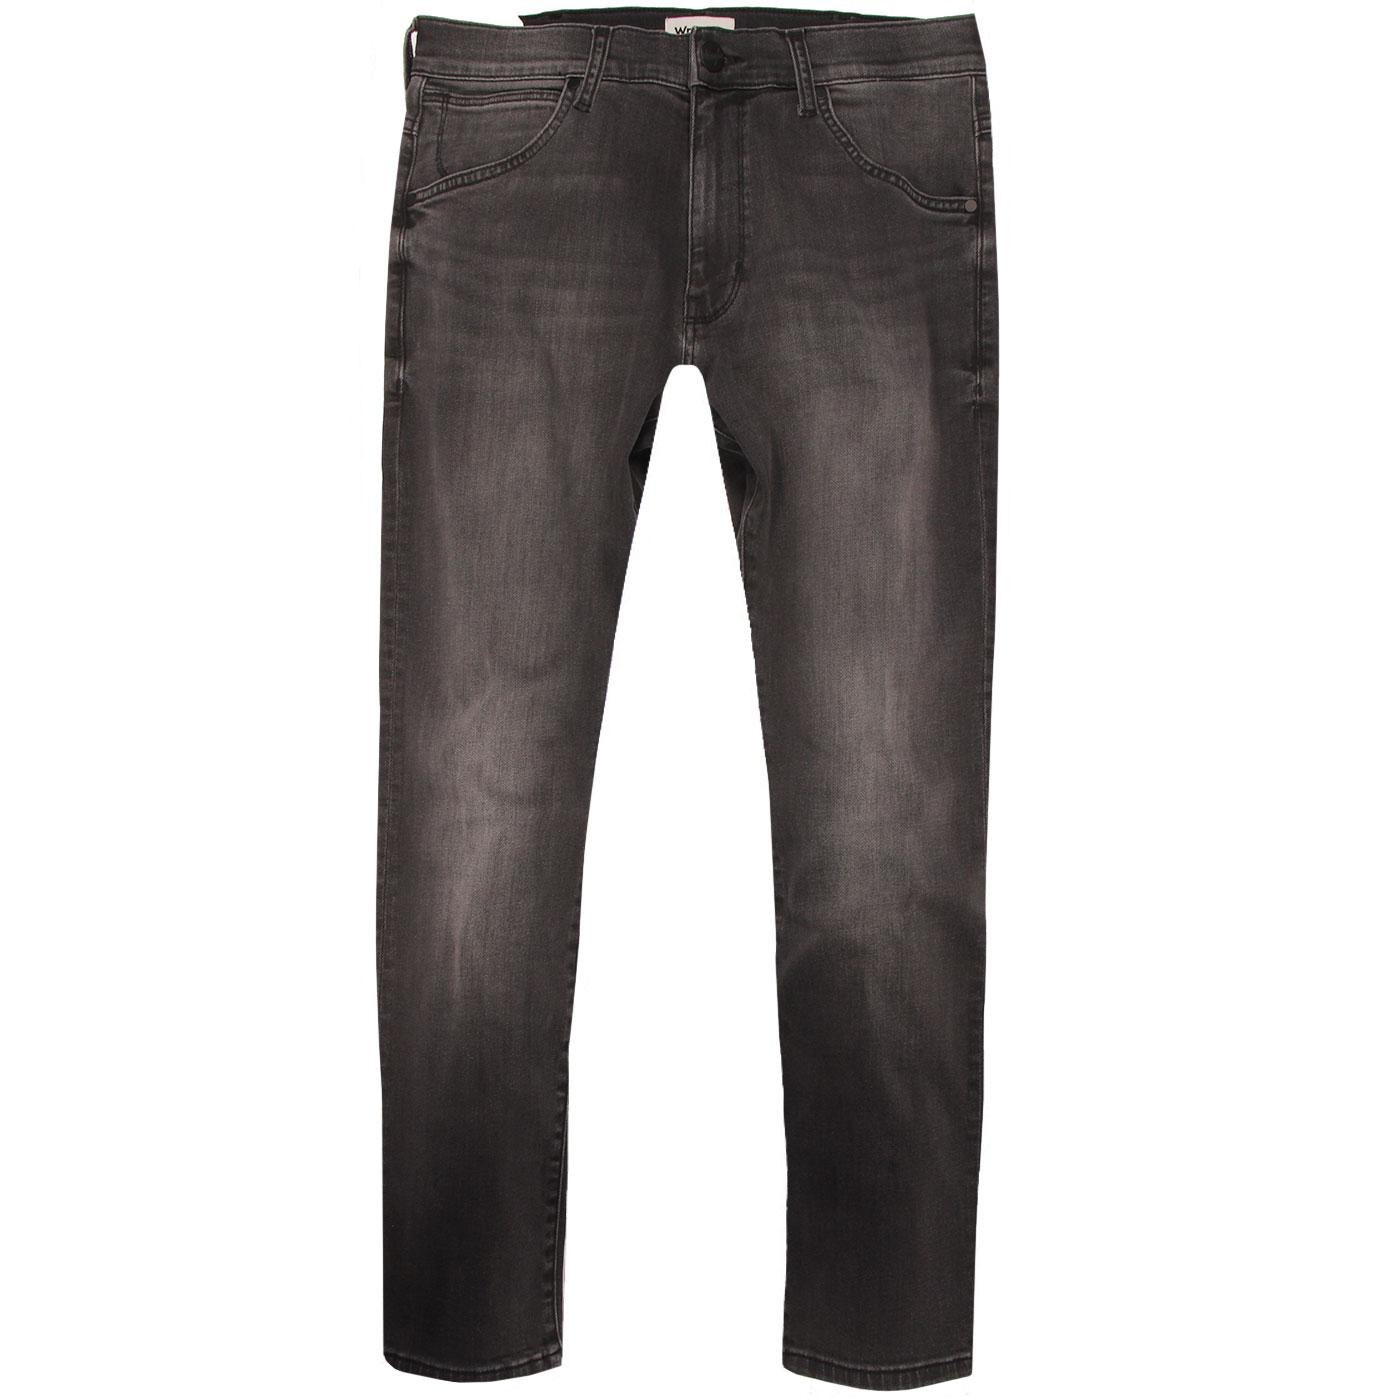 Larston WRANGLER Slim Tapered Denim Jeans - STEEL